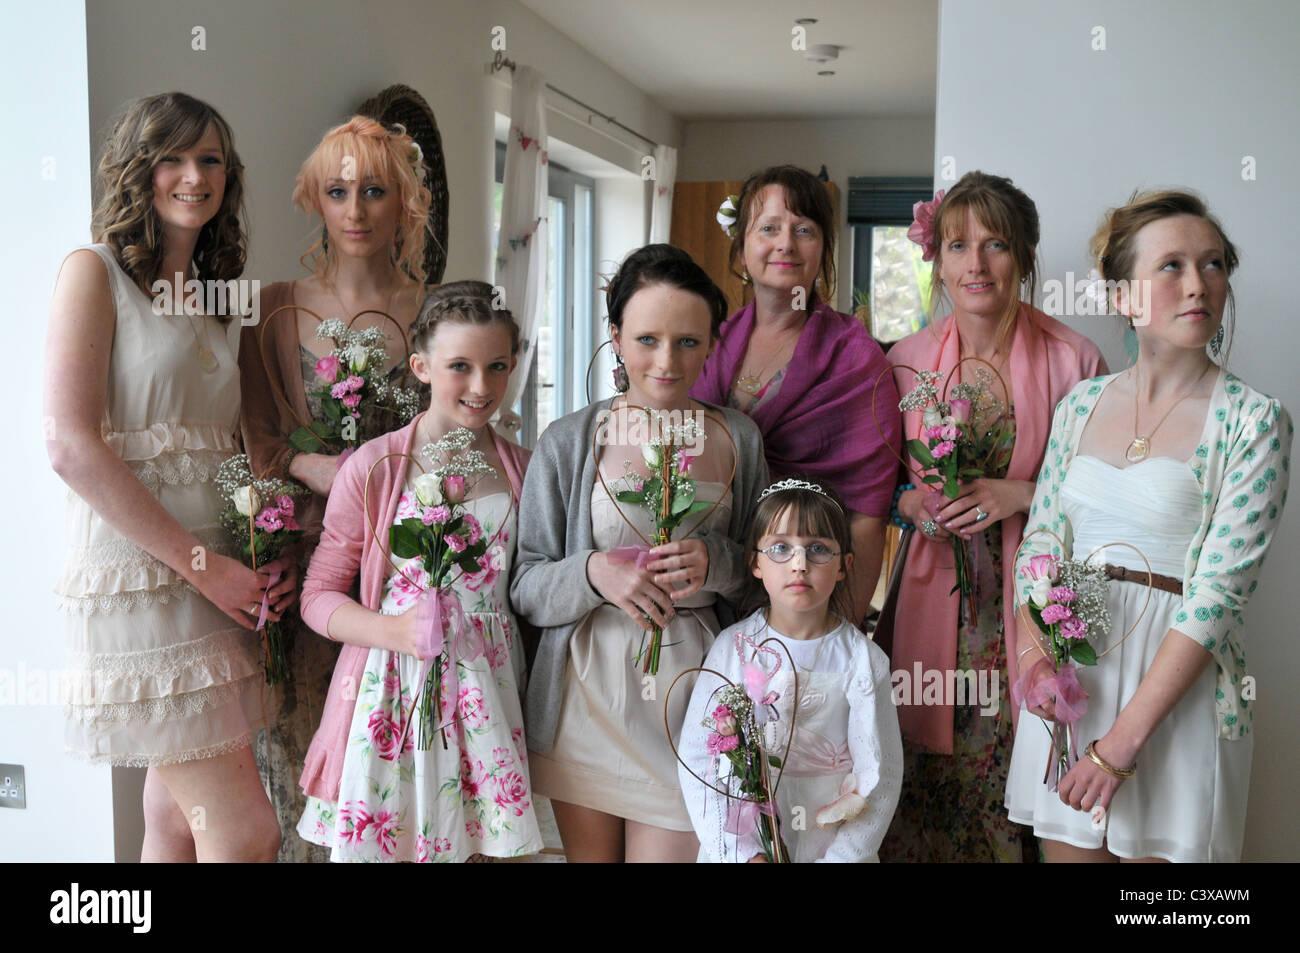 Three generations of bridesmaids, portrait. - Stock Image